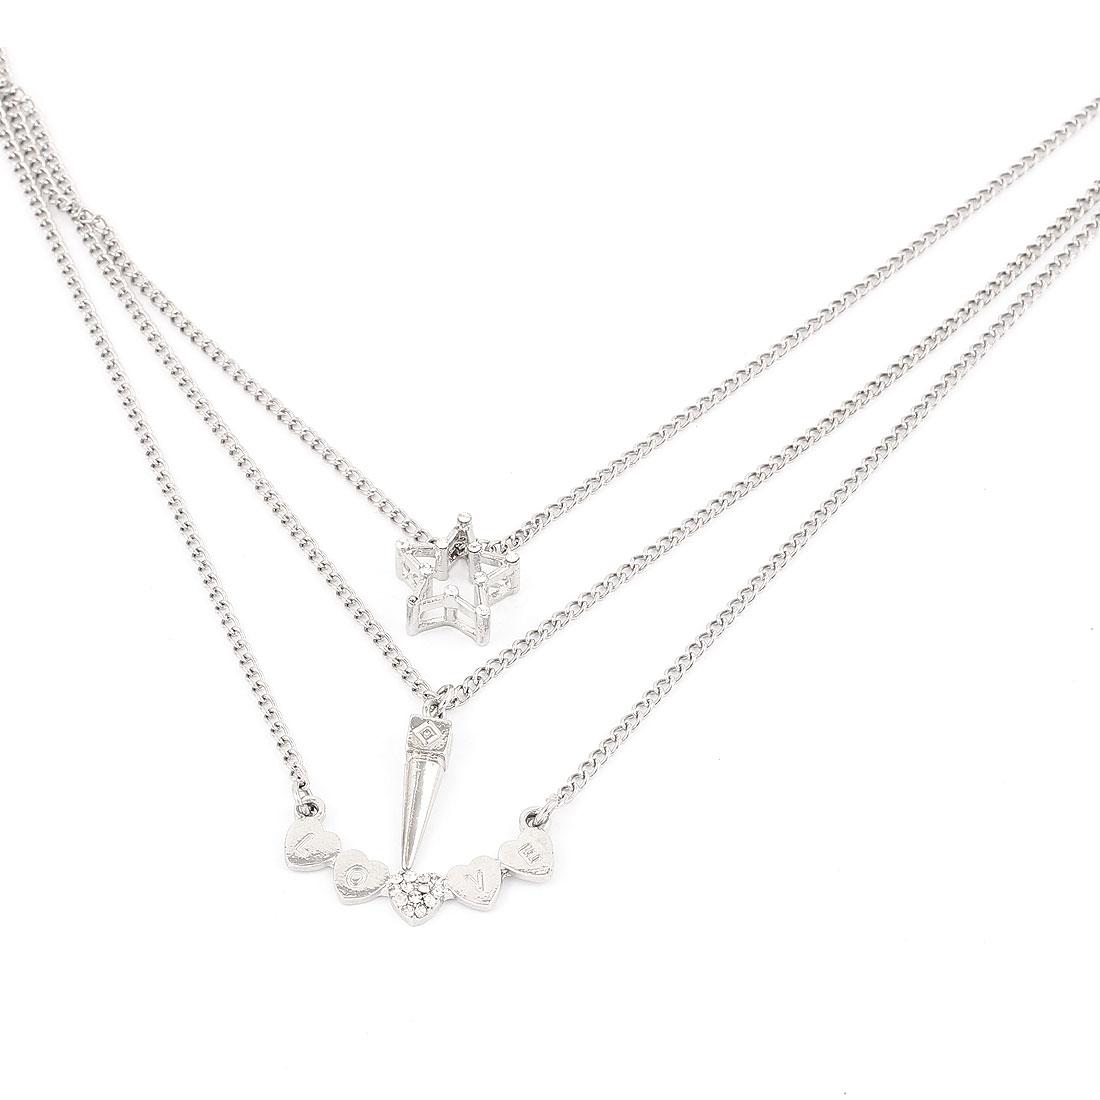 Ladies Women Metal Lobster Buckle Strip Link Three Layers Slim Chain Necklace Neckwear Collar Silver Tone